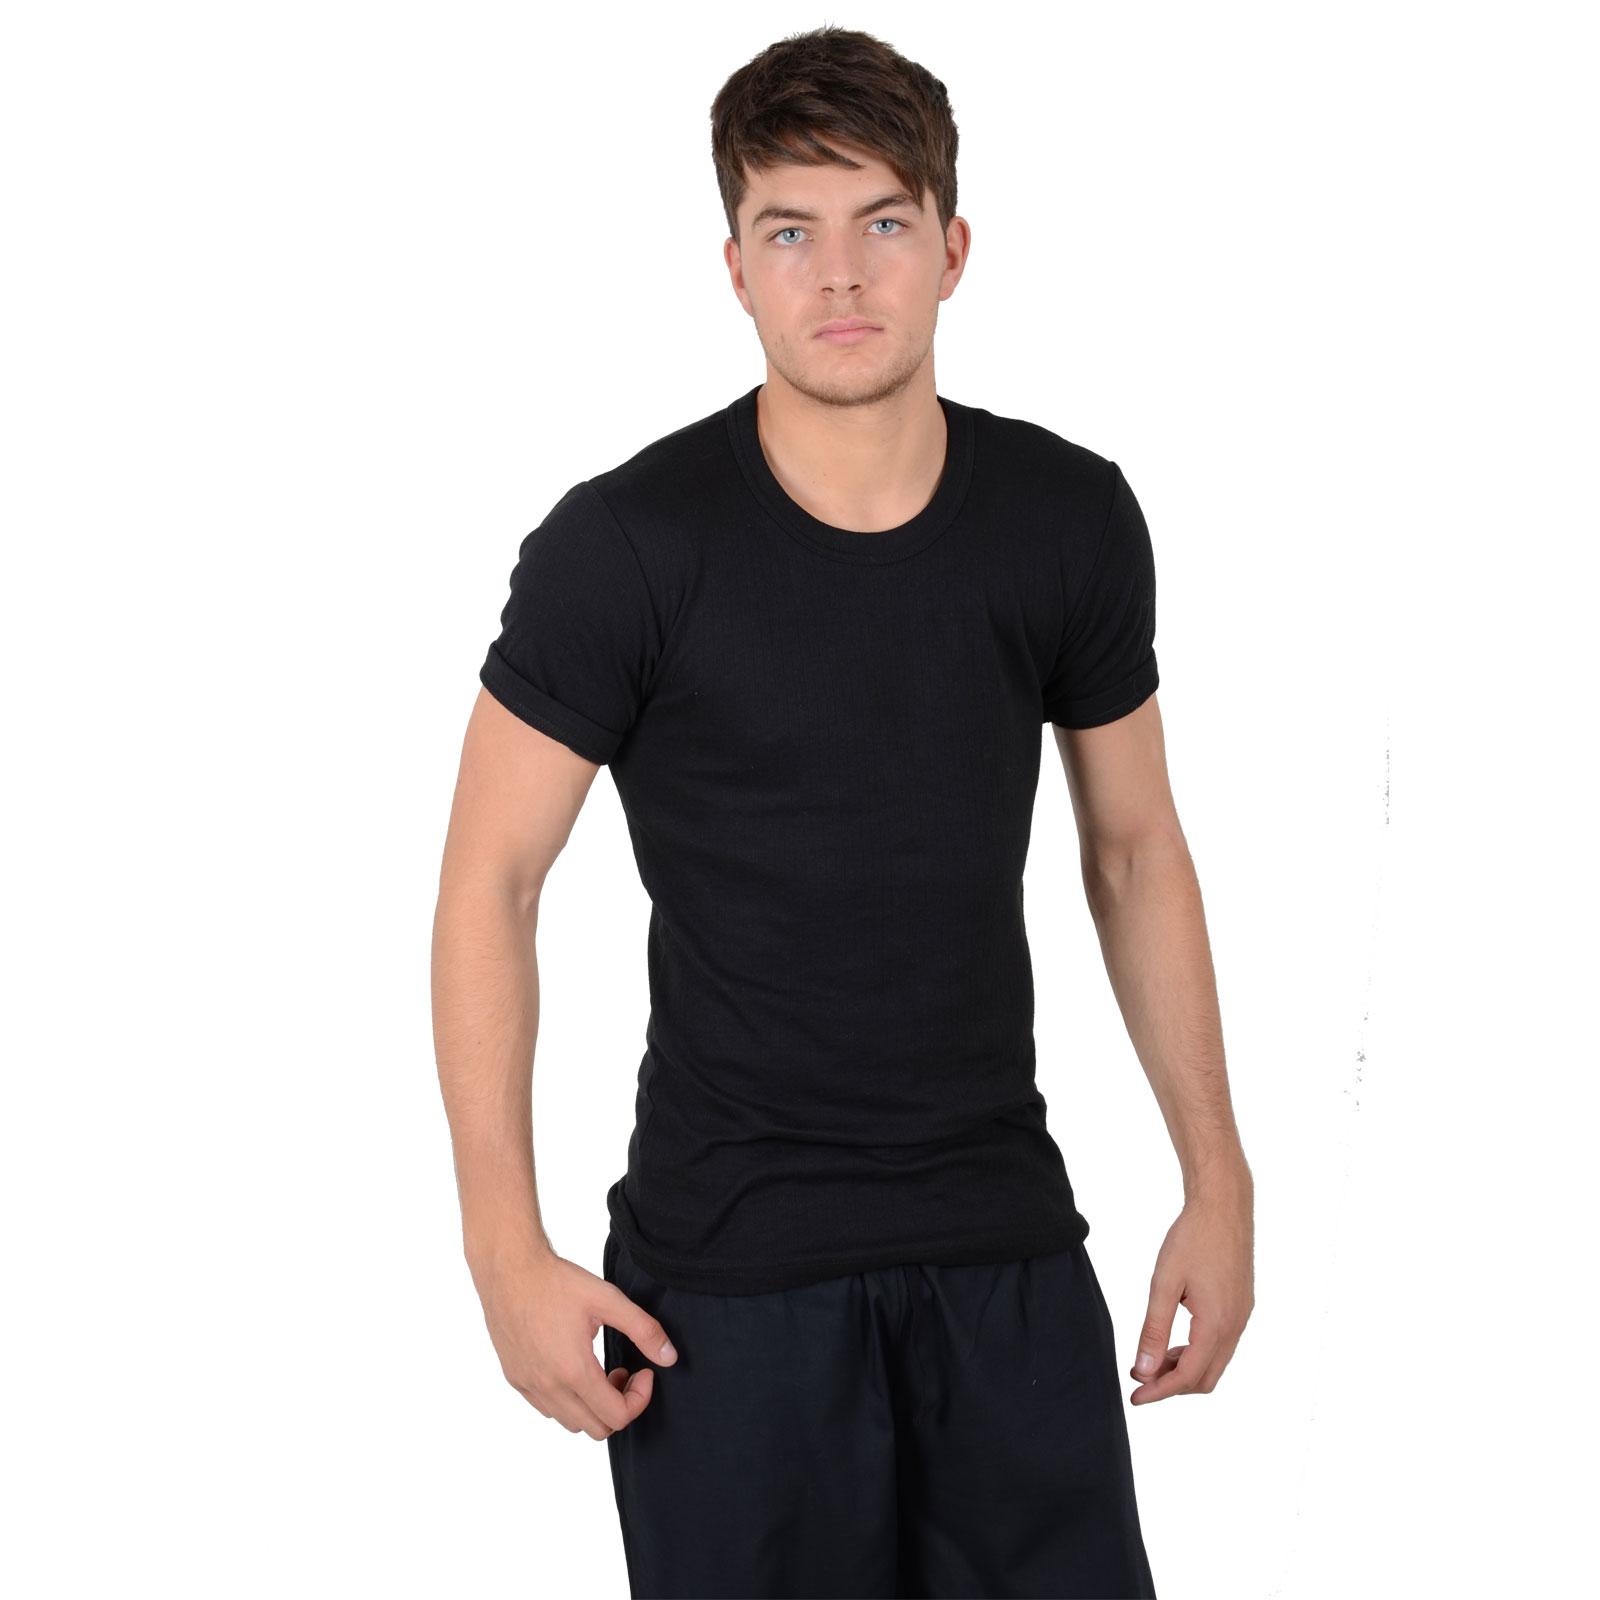 Men 39 s black winter thermal underwear crew neck short for Mens black thermal t shirts